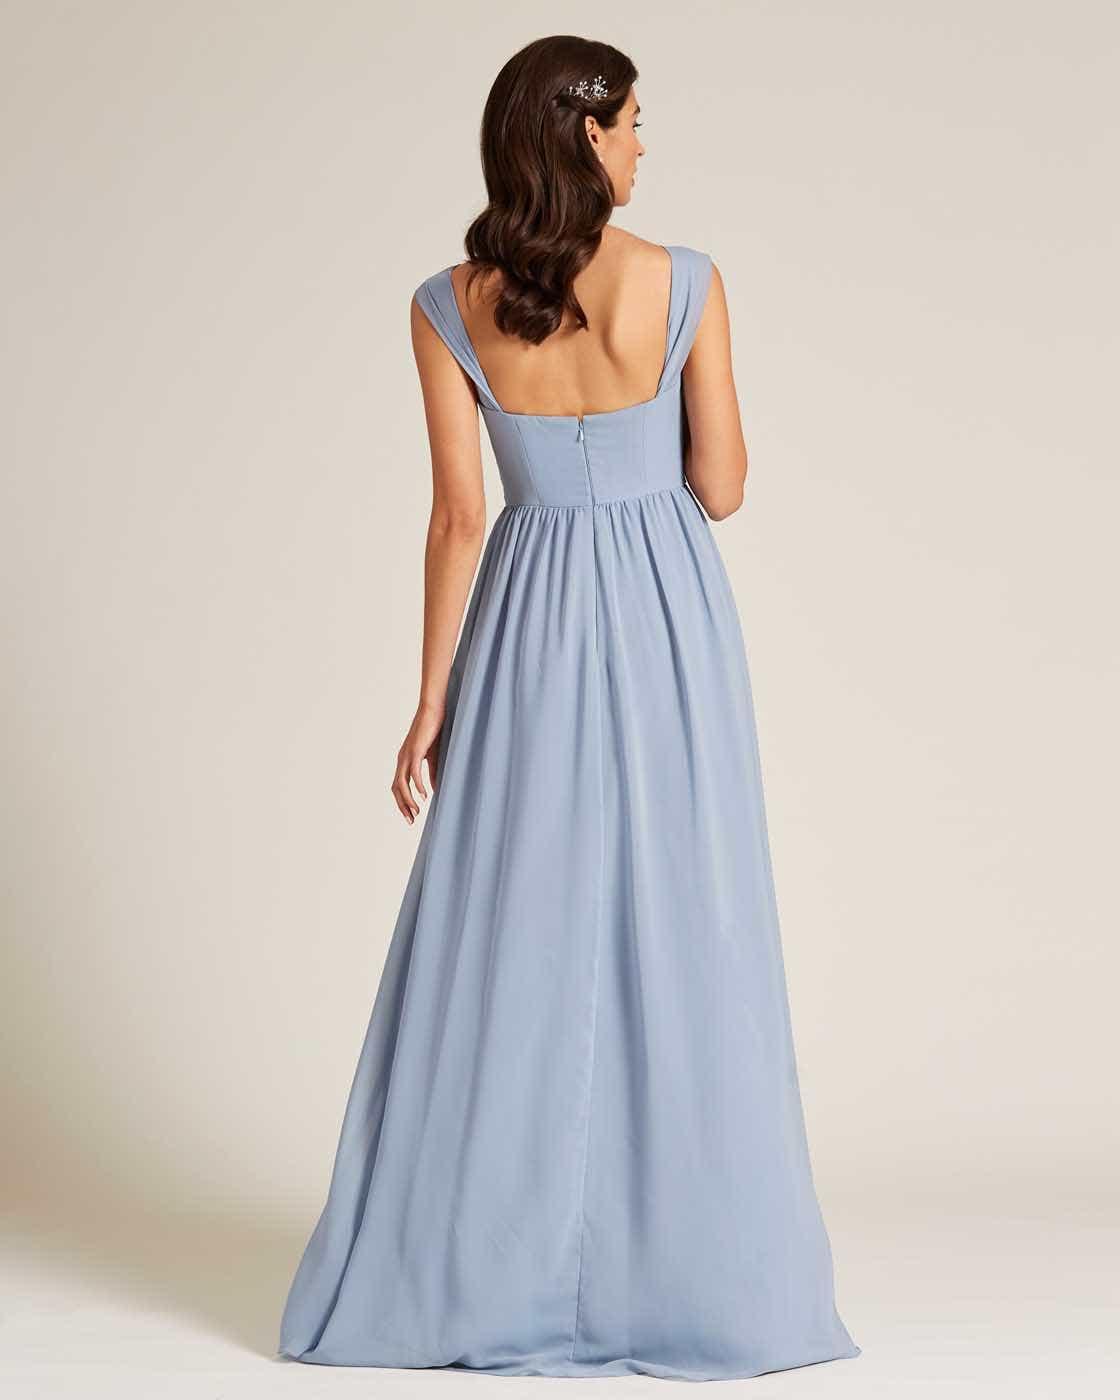 Blue Thick Strap Sweetheart Neckline Dress - Back